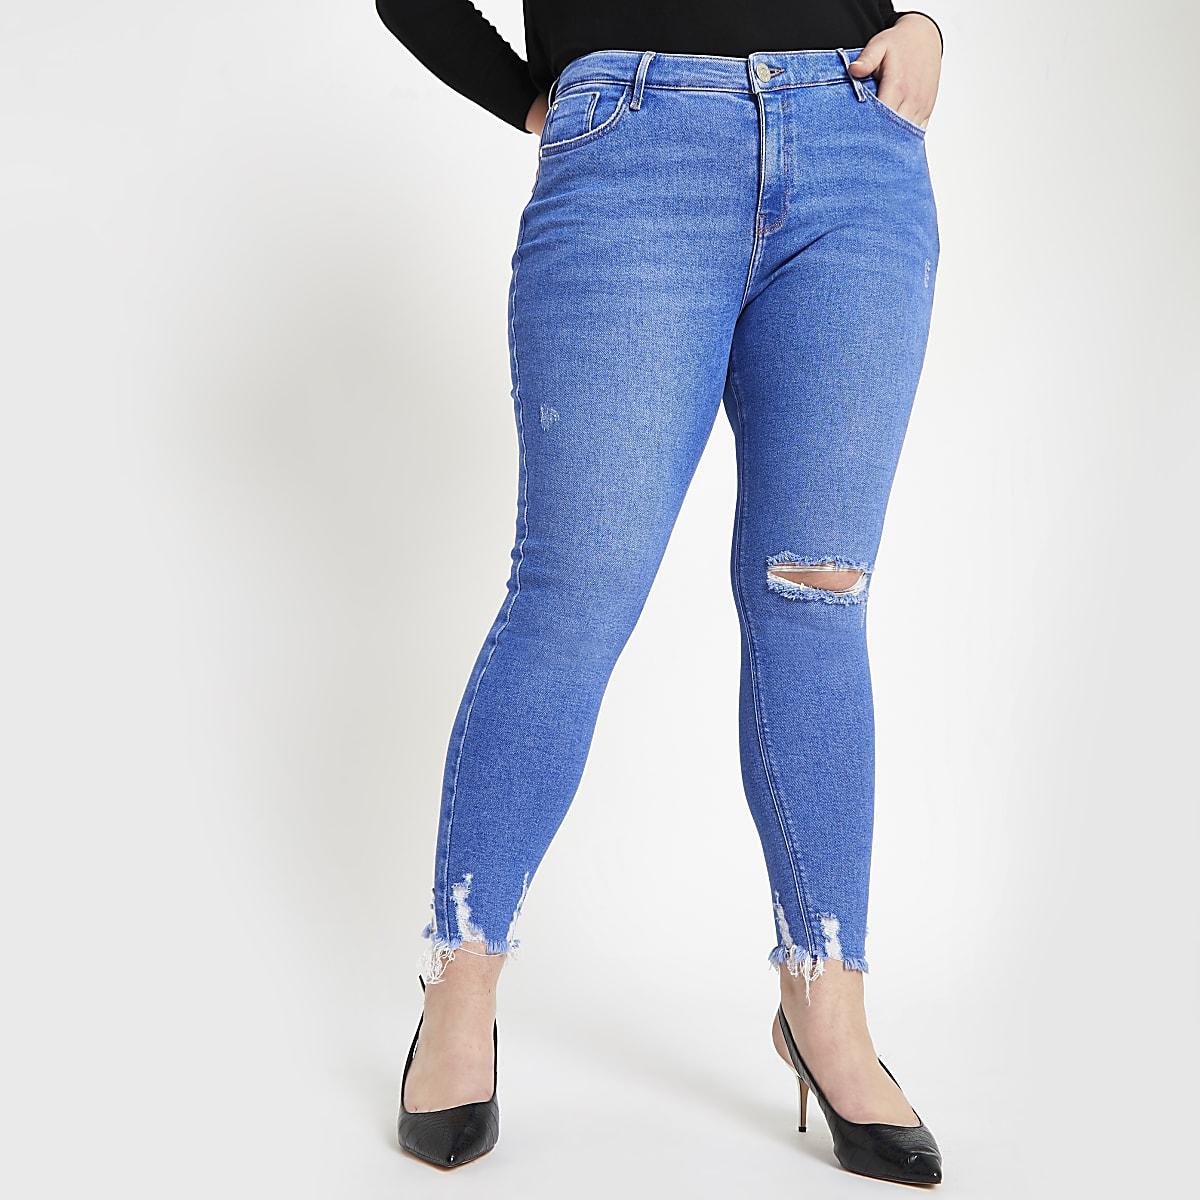 RI Plus - Amelie - Felblauwe superskinny ripped jeans